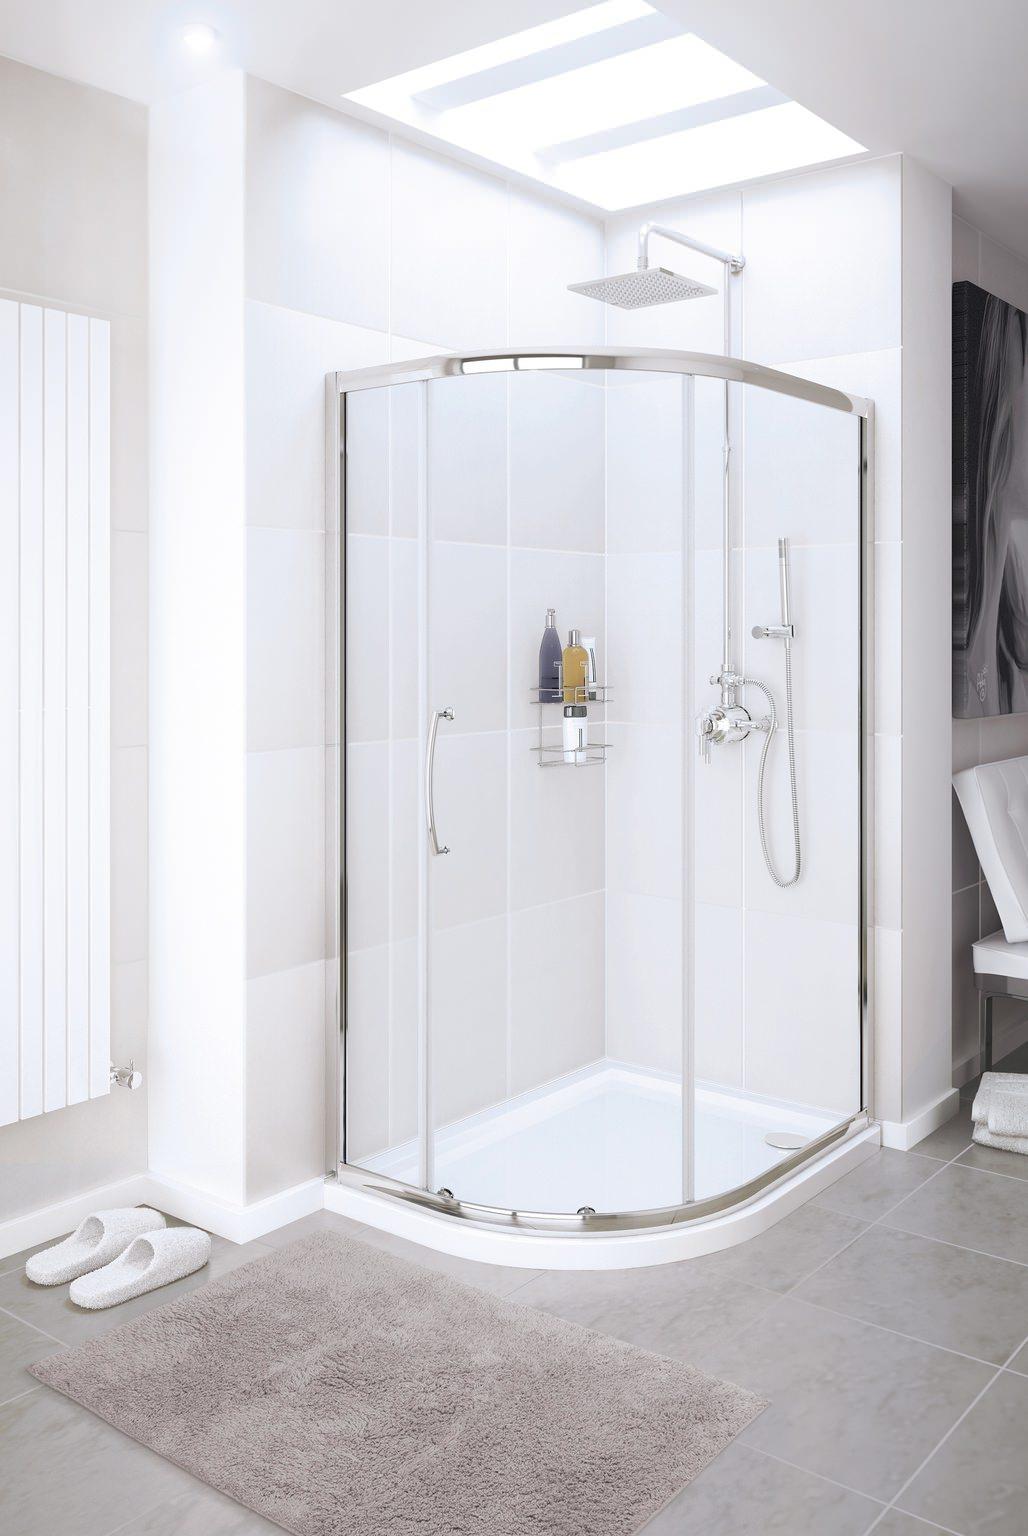 Lakes Classic Single Door Offset Quadrant Shower Enclosure 900 x 760mm